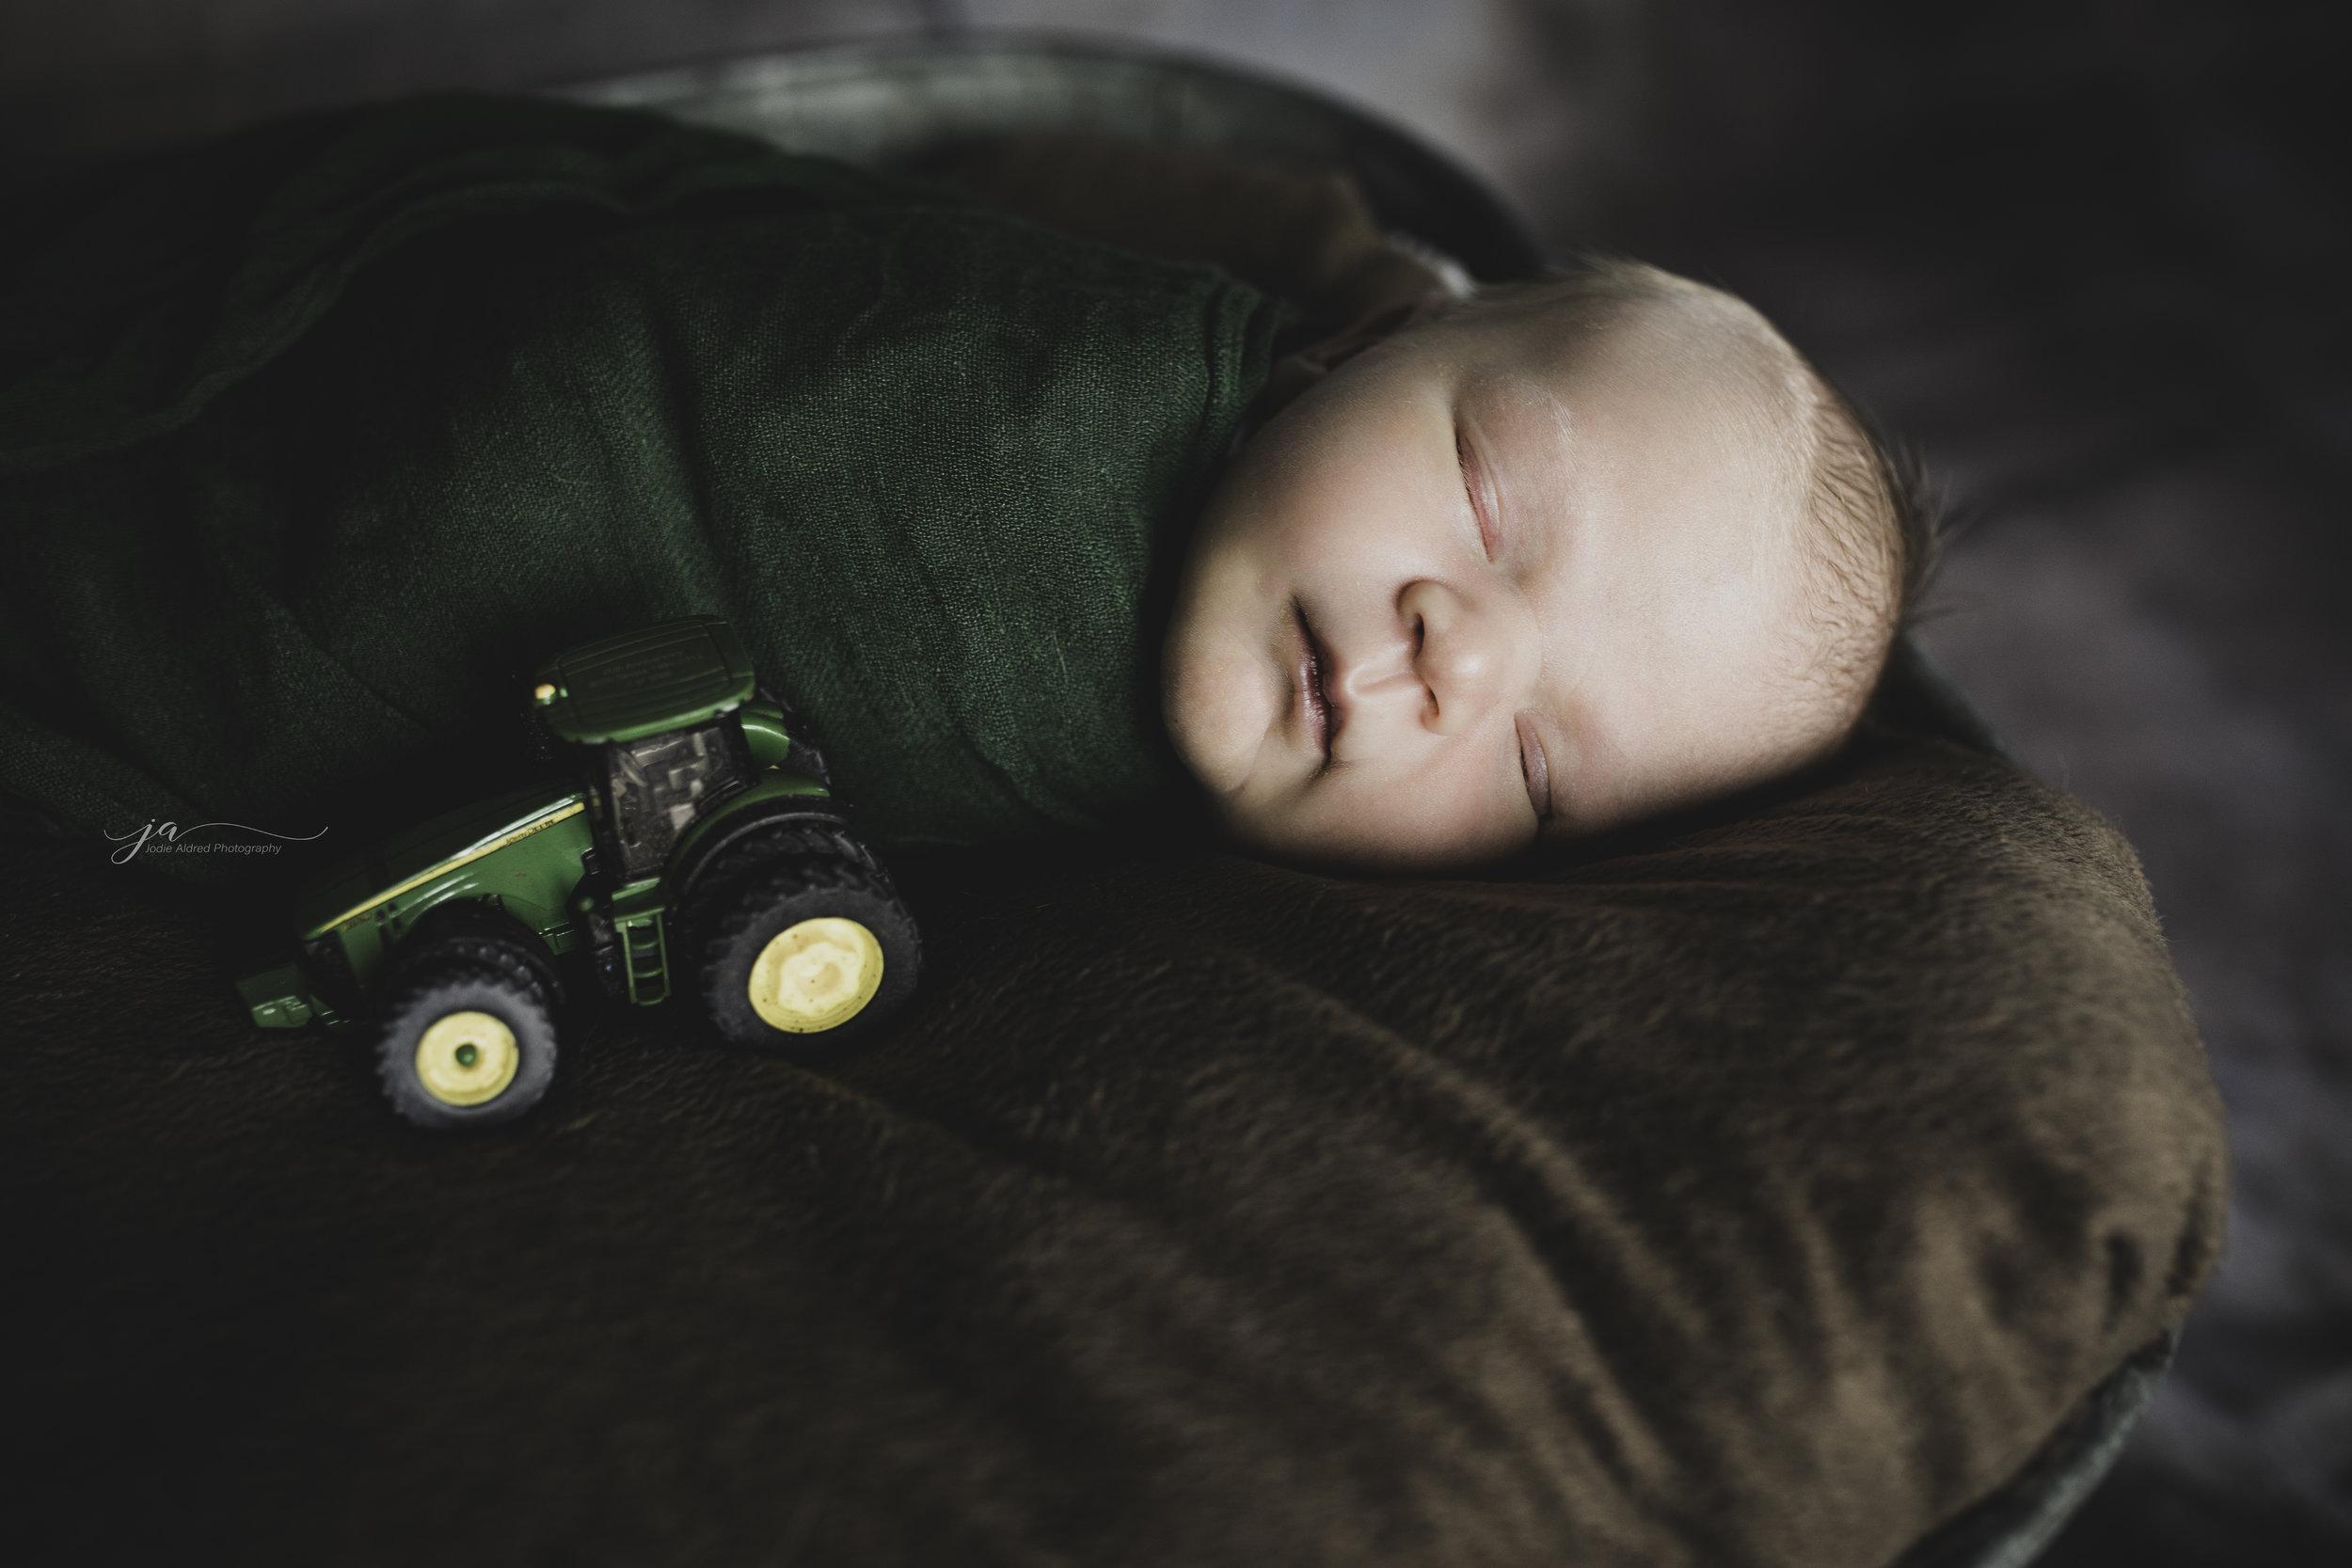 Newborn-tractor-john-deere-farm-boy-jofie-aldred-photography-london-ontario-middlesex-lambton-elgin-chatham.jpg